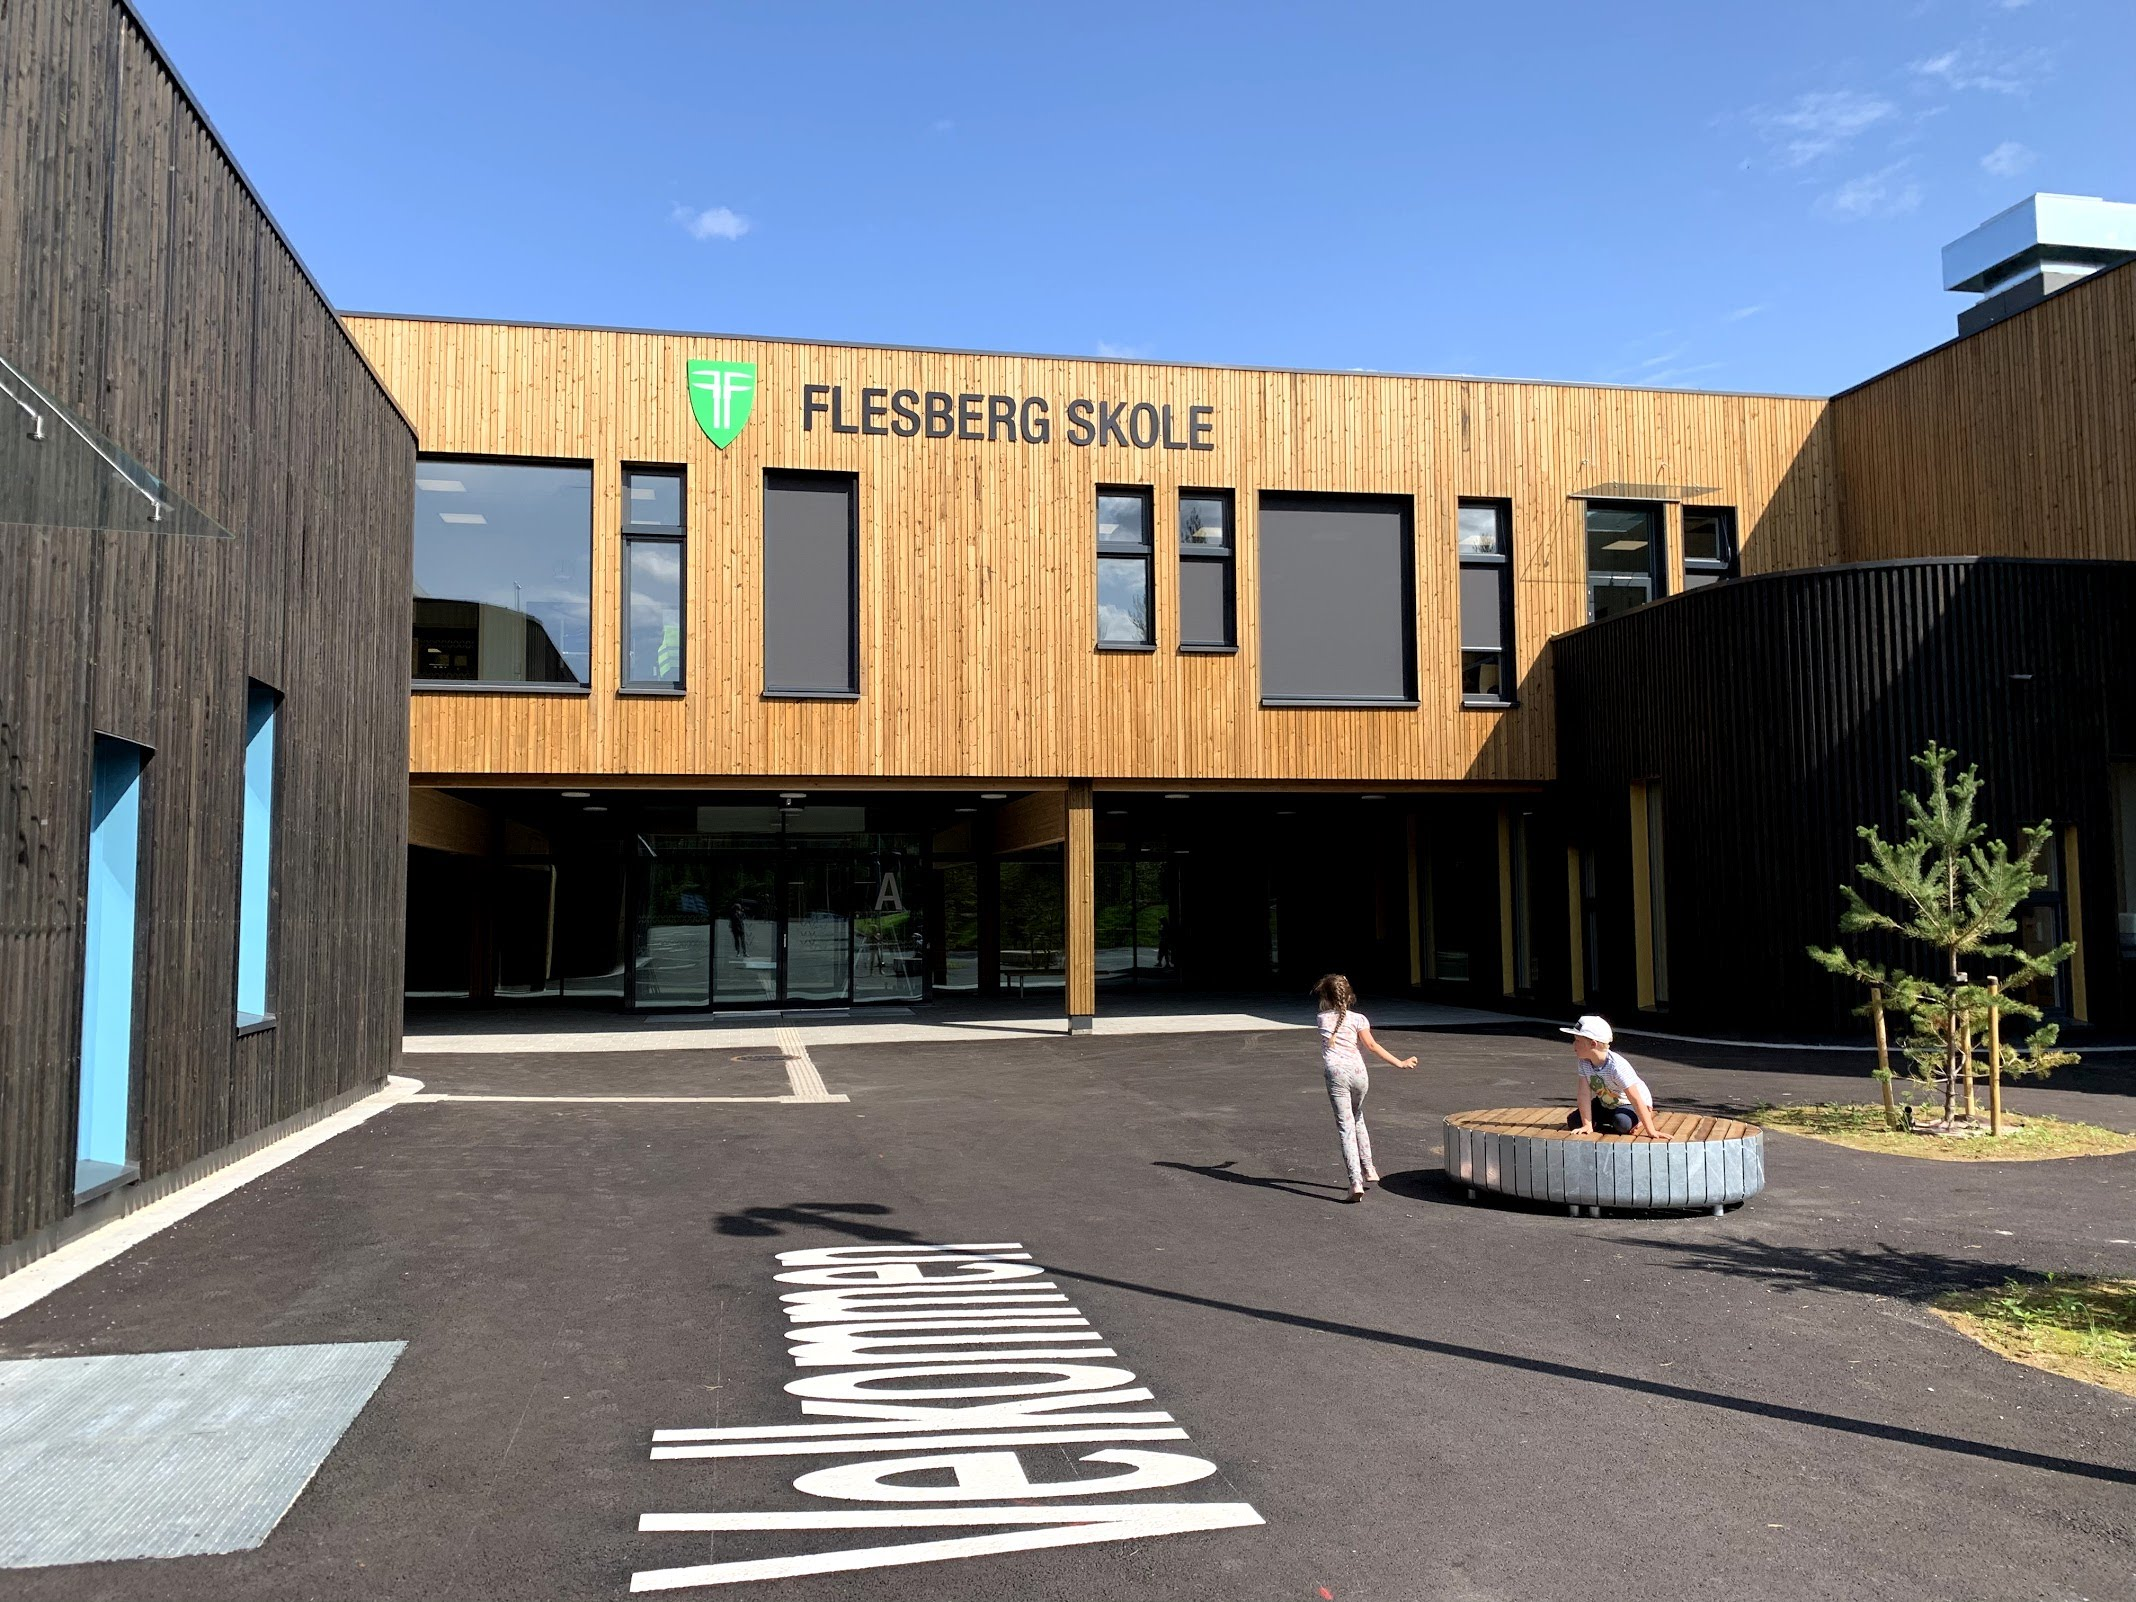 Flesberg skole - Skattekista